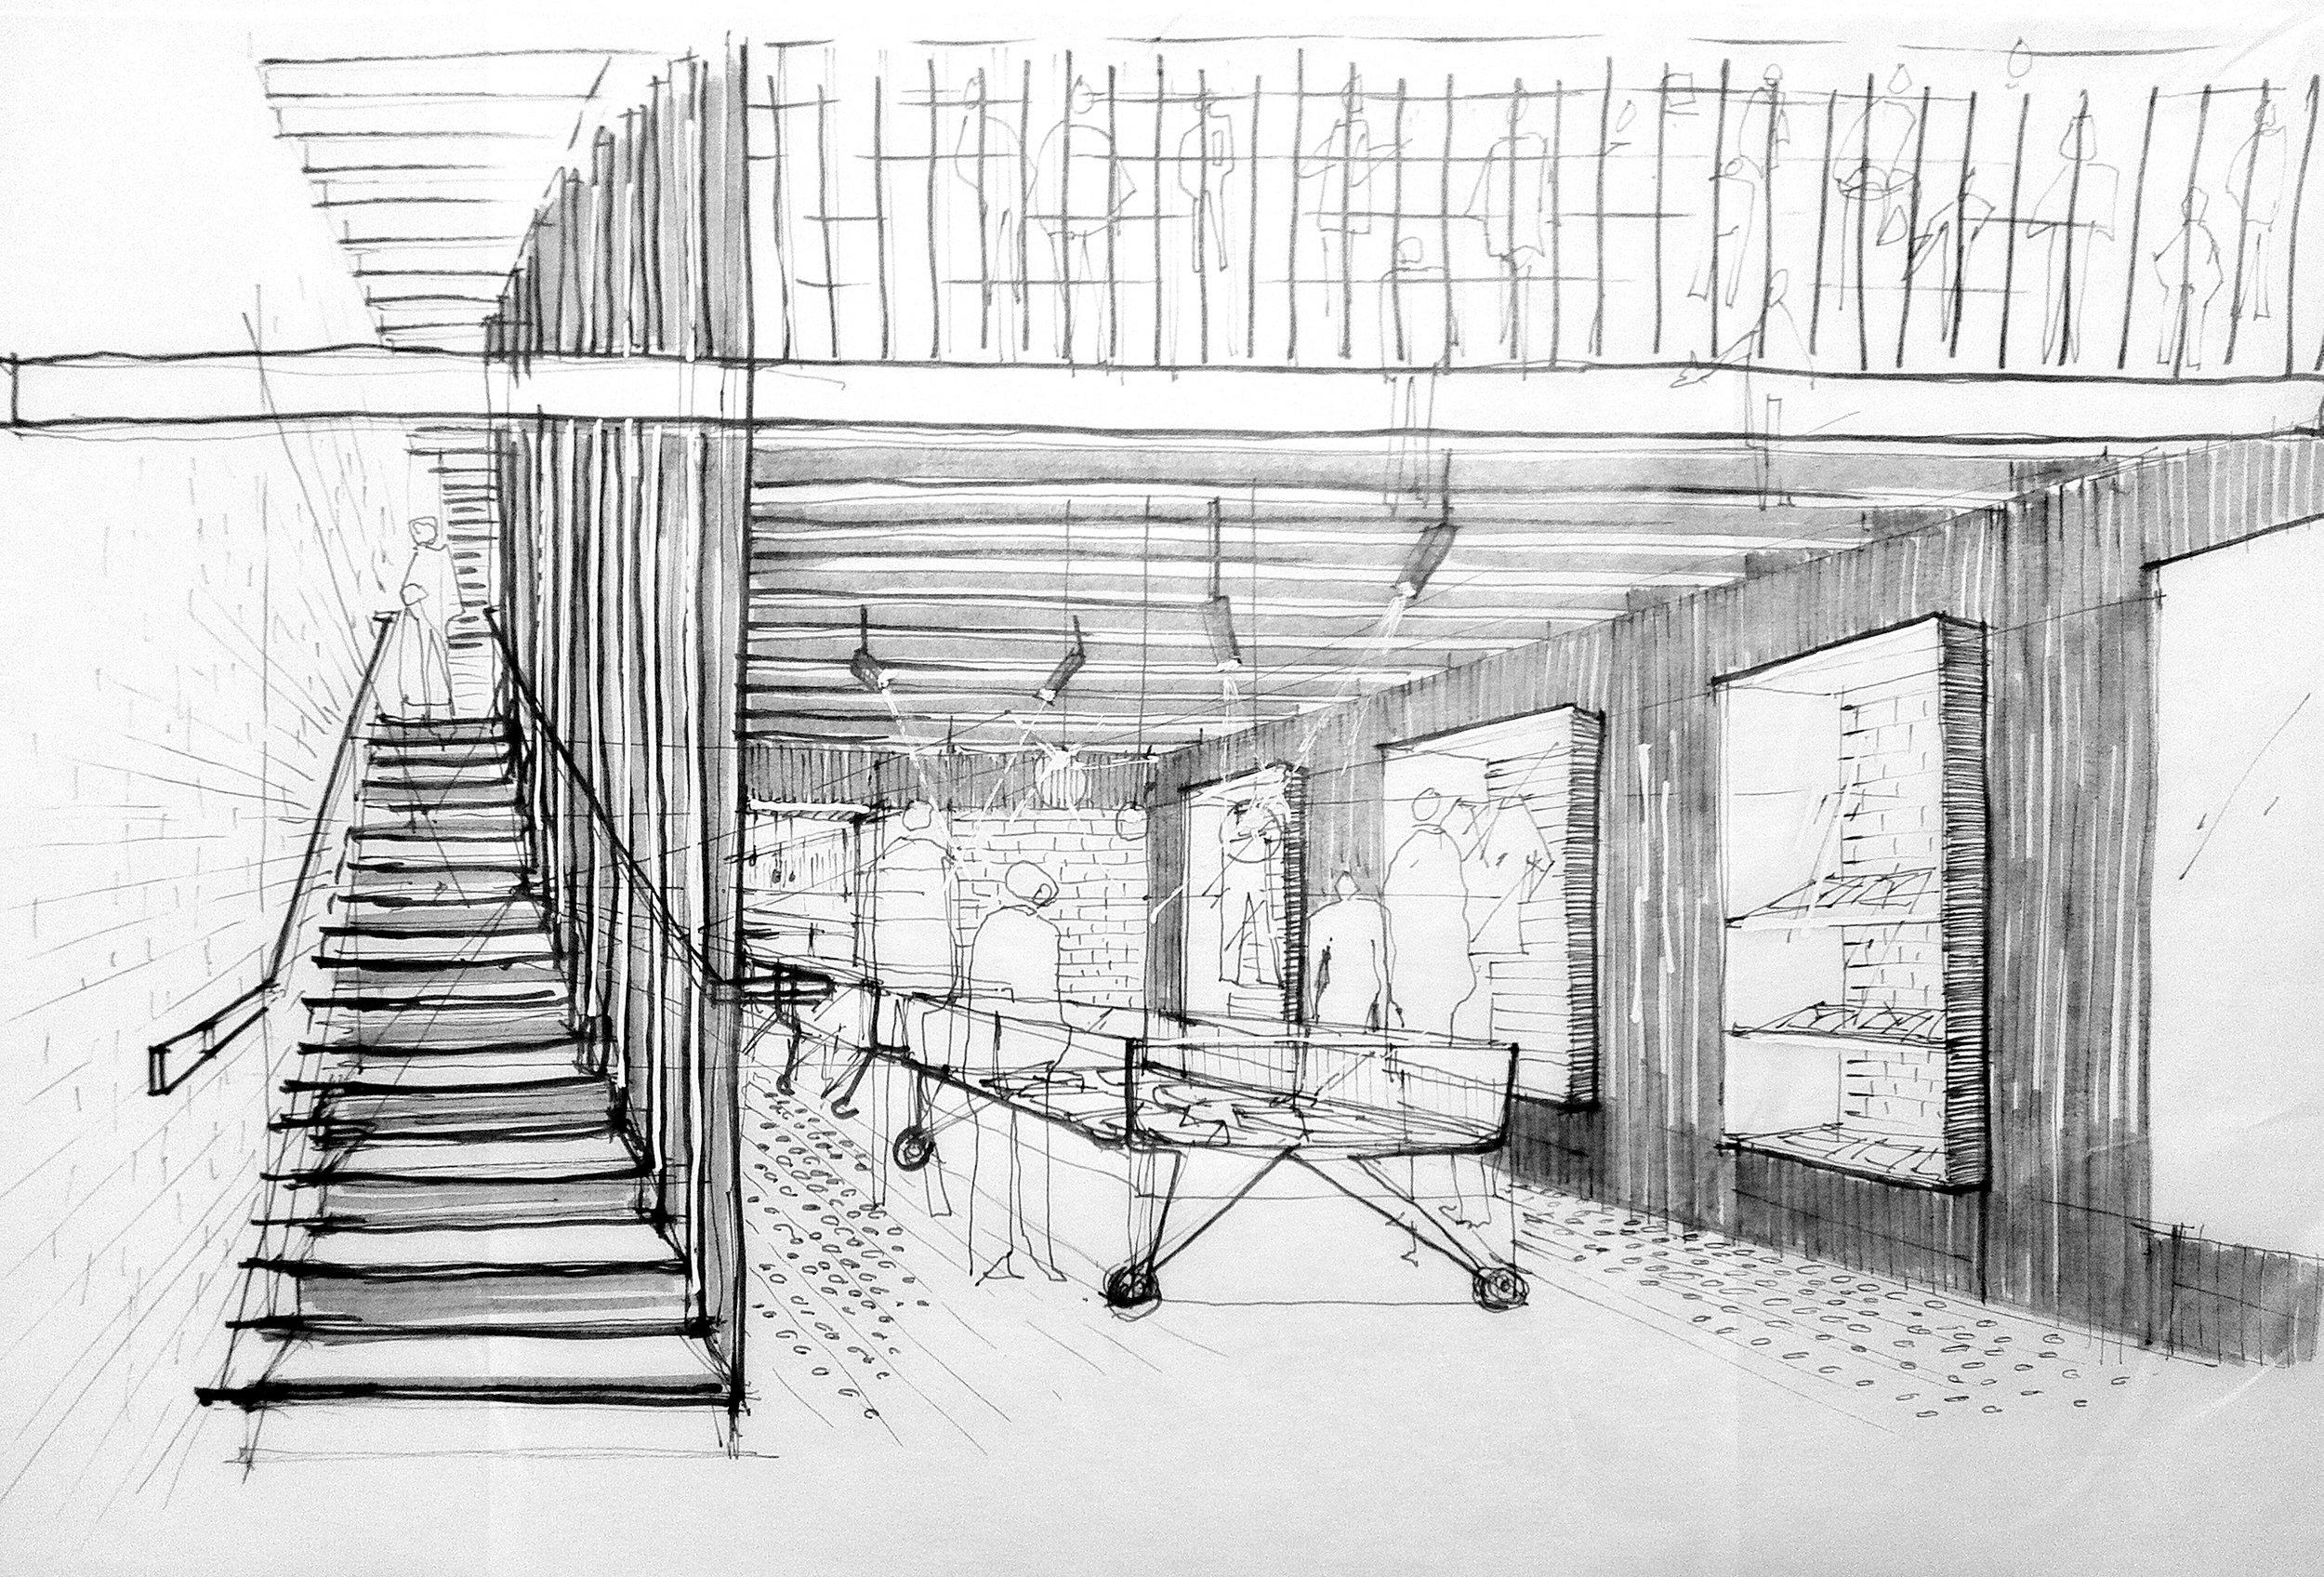 studio-saint-bars-and-restaurants-maketto-washington-dc-sketch-3